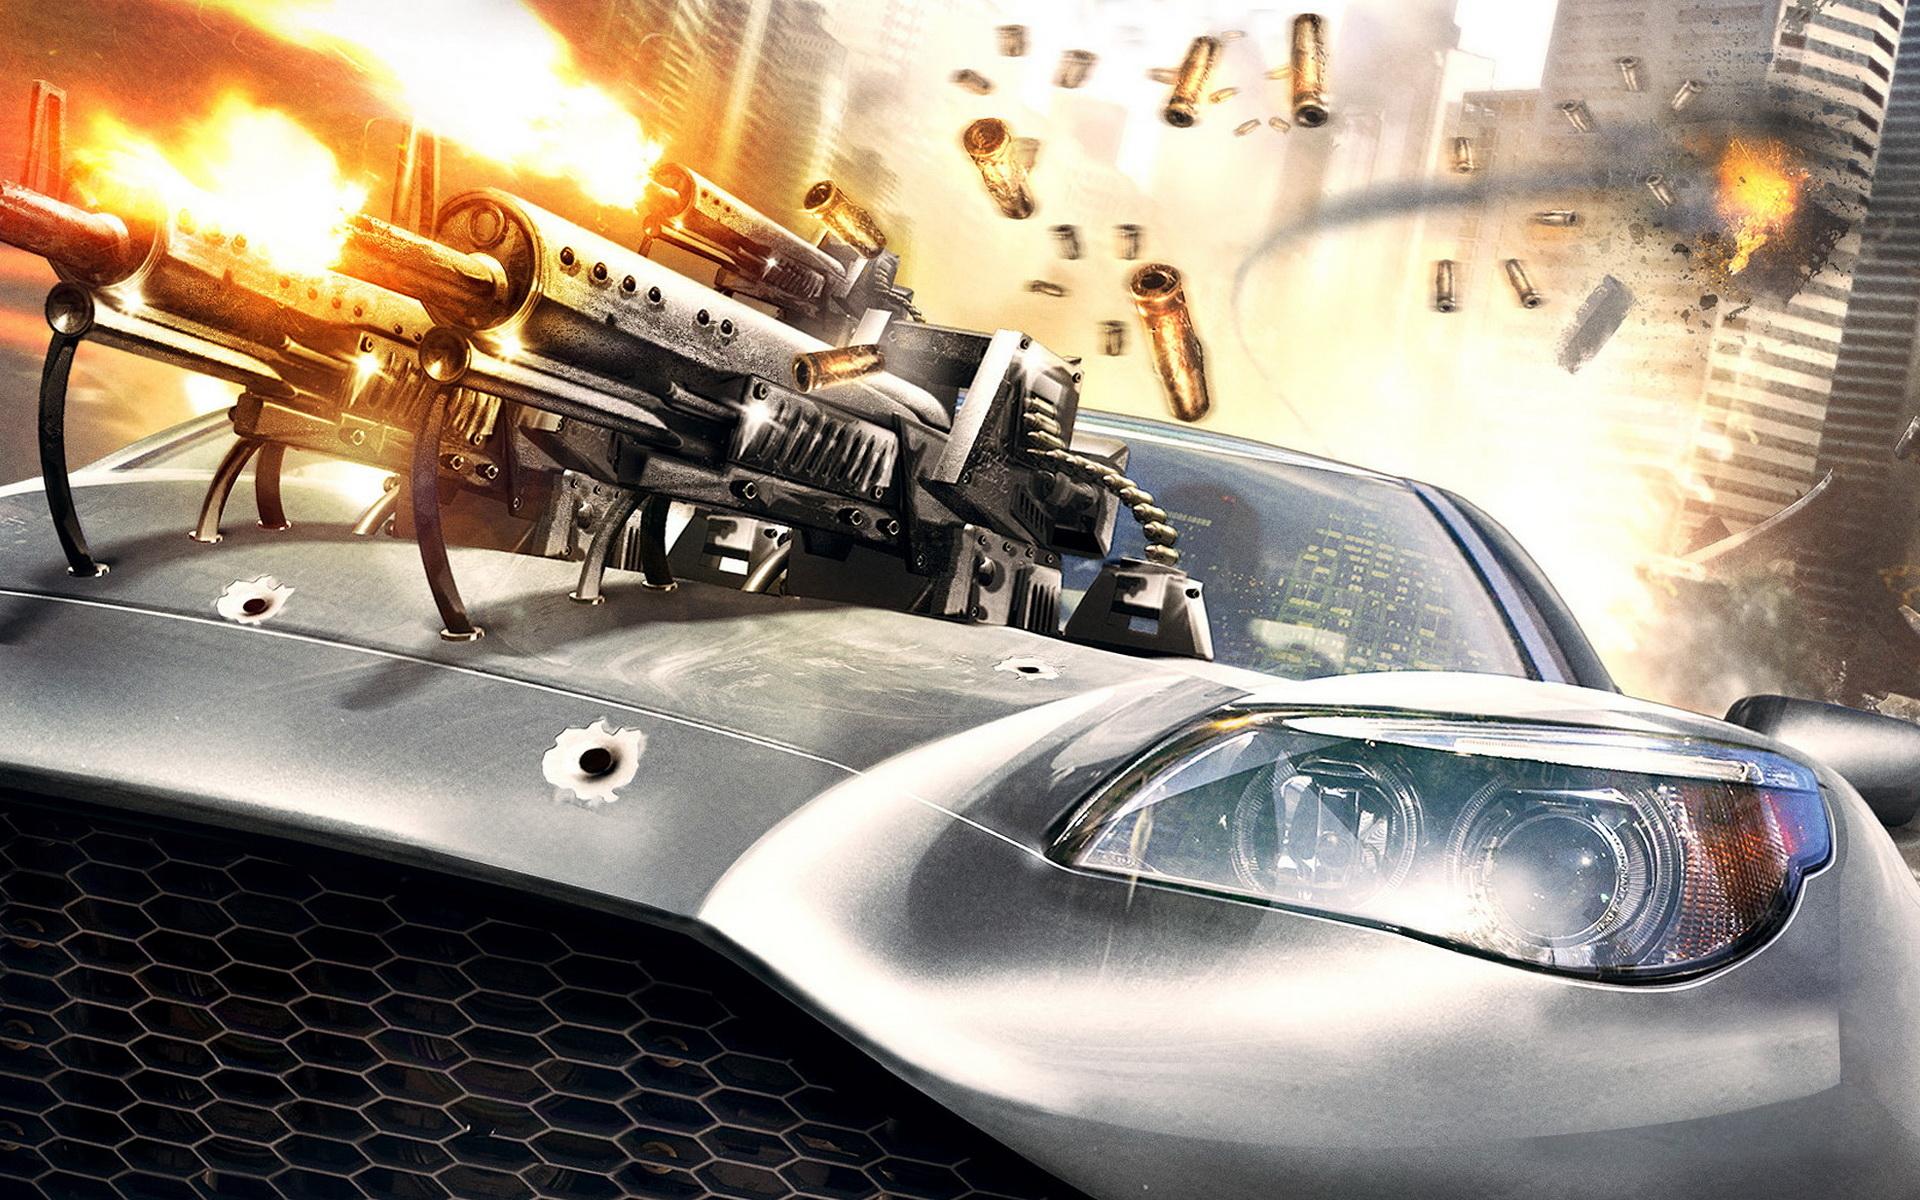 Games_Full_Auto_023459_.jpg - -